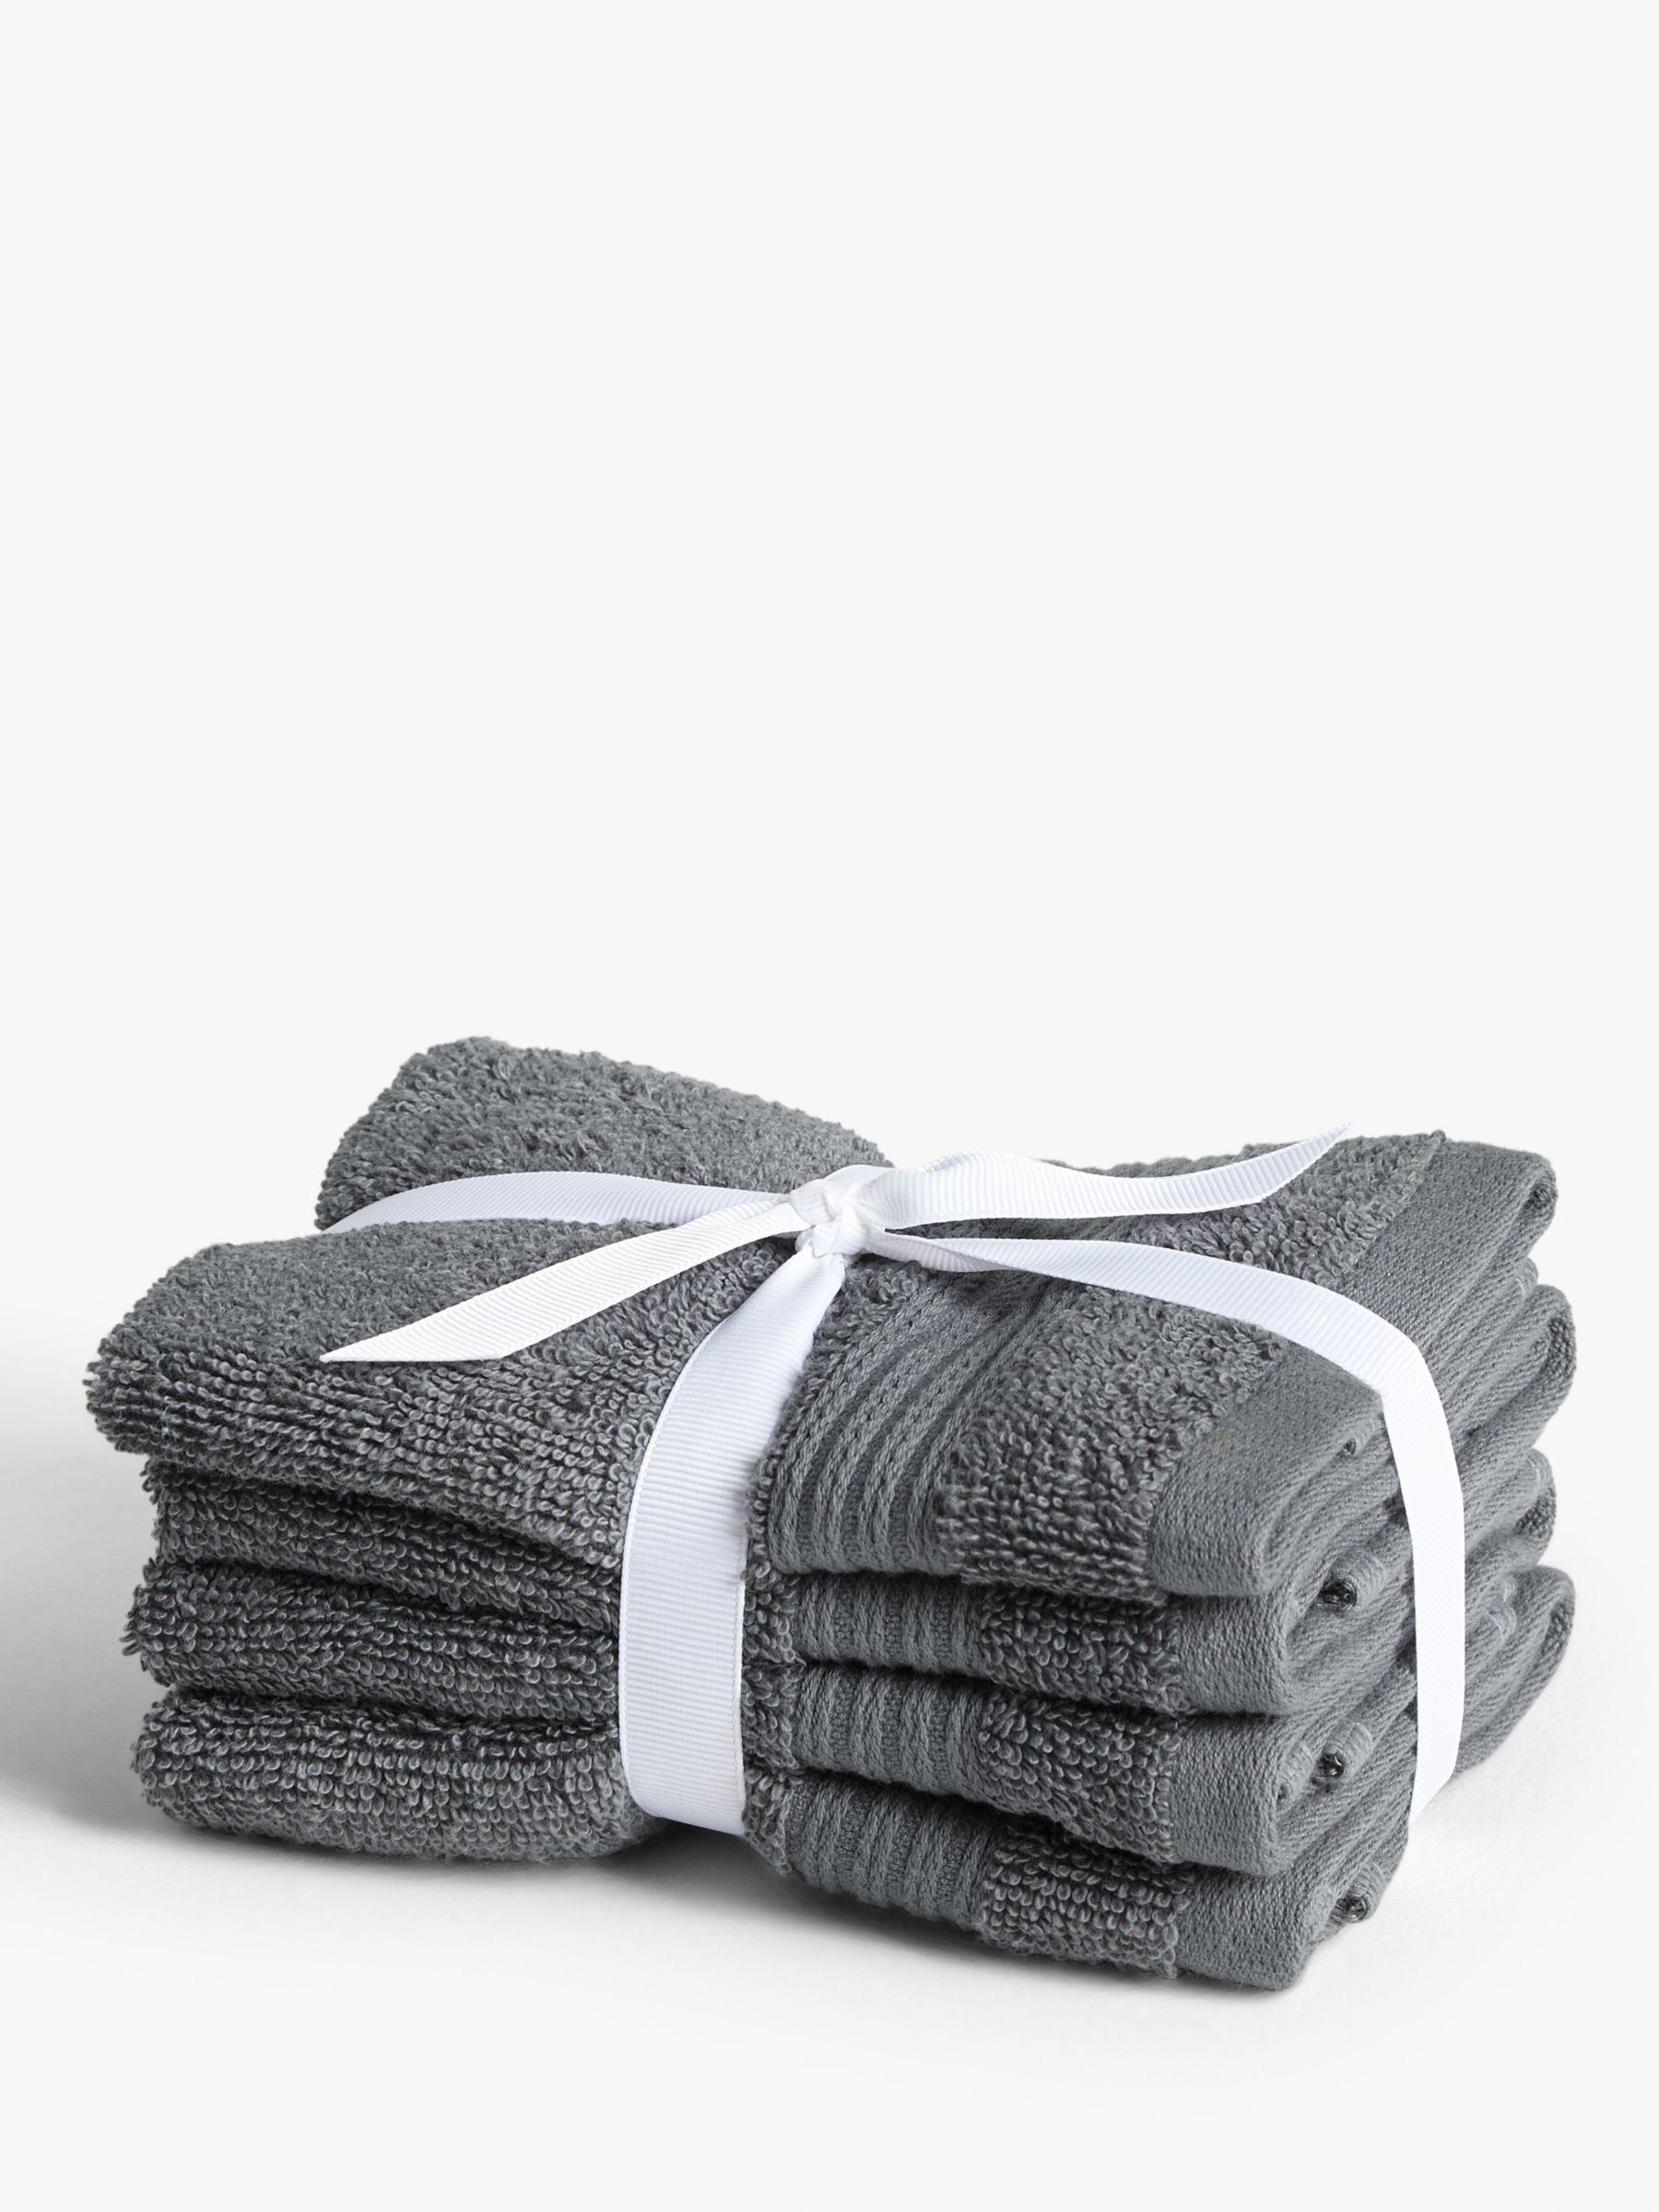 John Lewis & Partners Cotton Face Cloths, Pack of 4